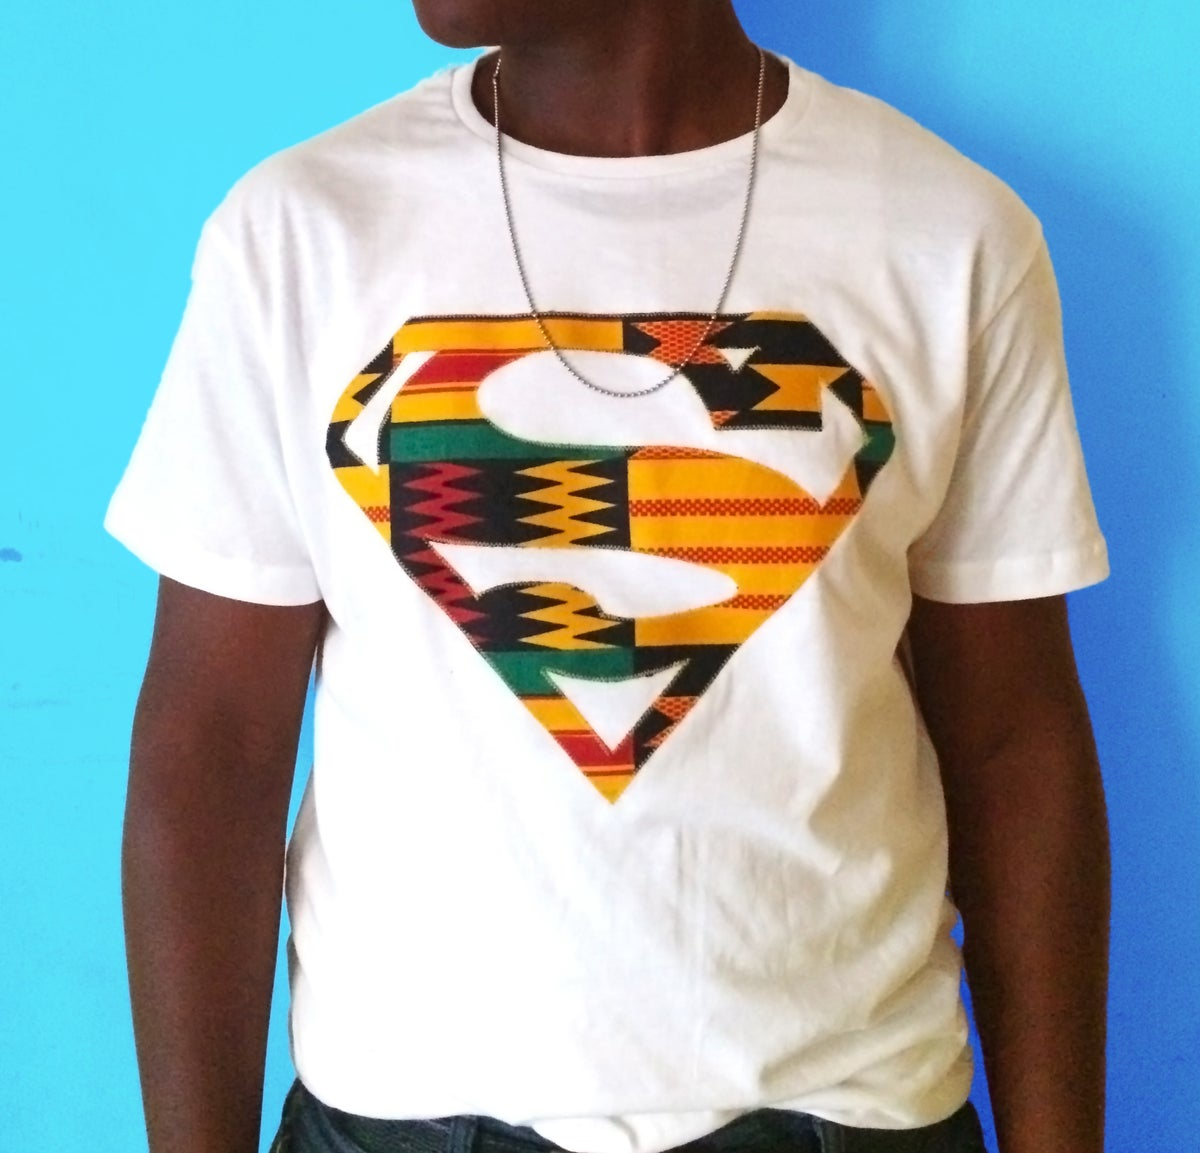 Ziindya Afro Superman Men 39 S Tee Shirt With Kente Hand